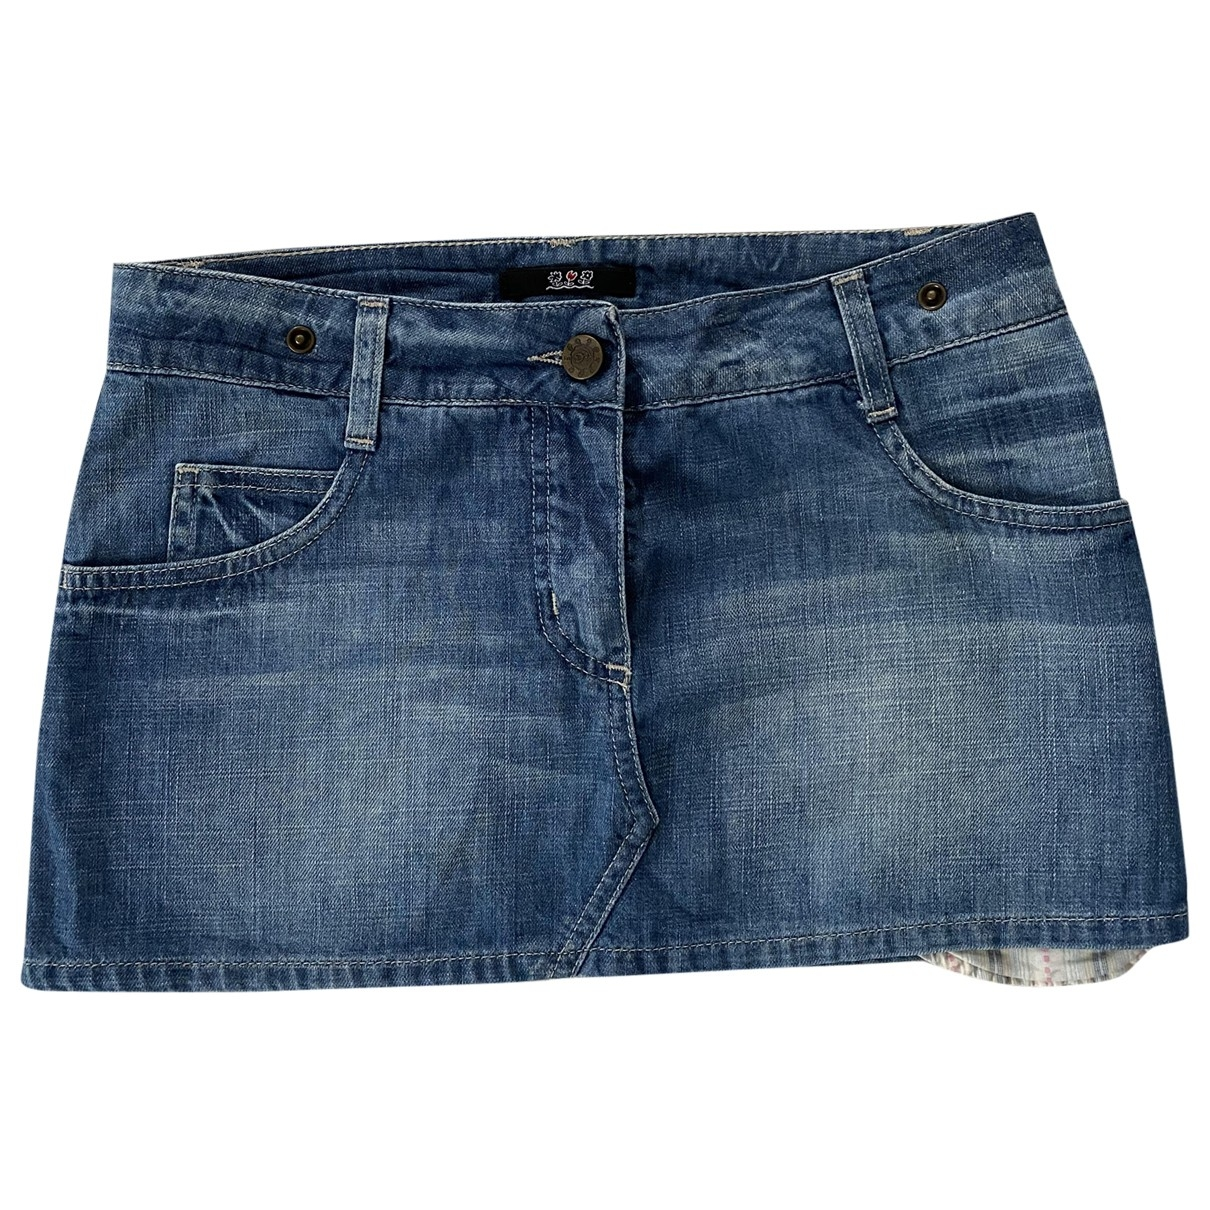 Patrizia Pepe \N Blue Cotton skirt for Women 40 IT